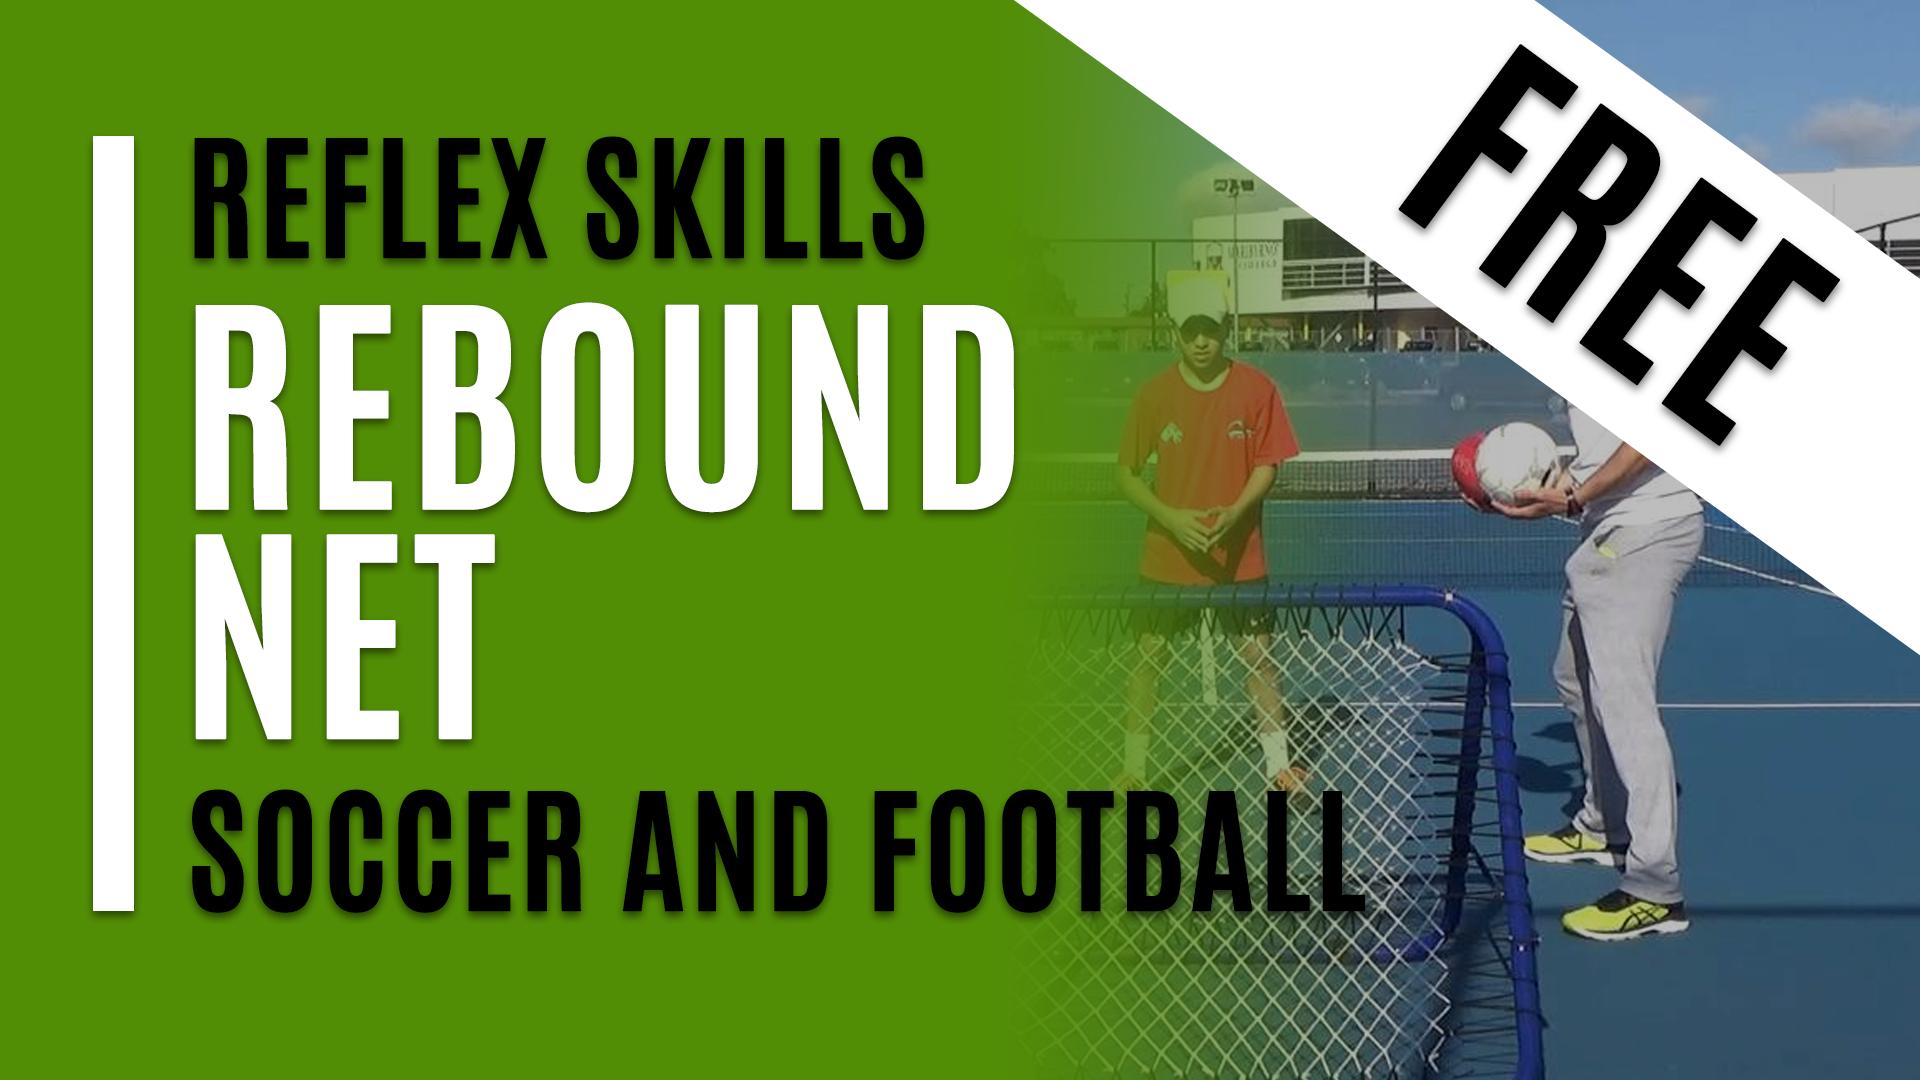 Rebound Net Soccer and Football